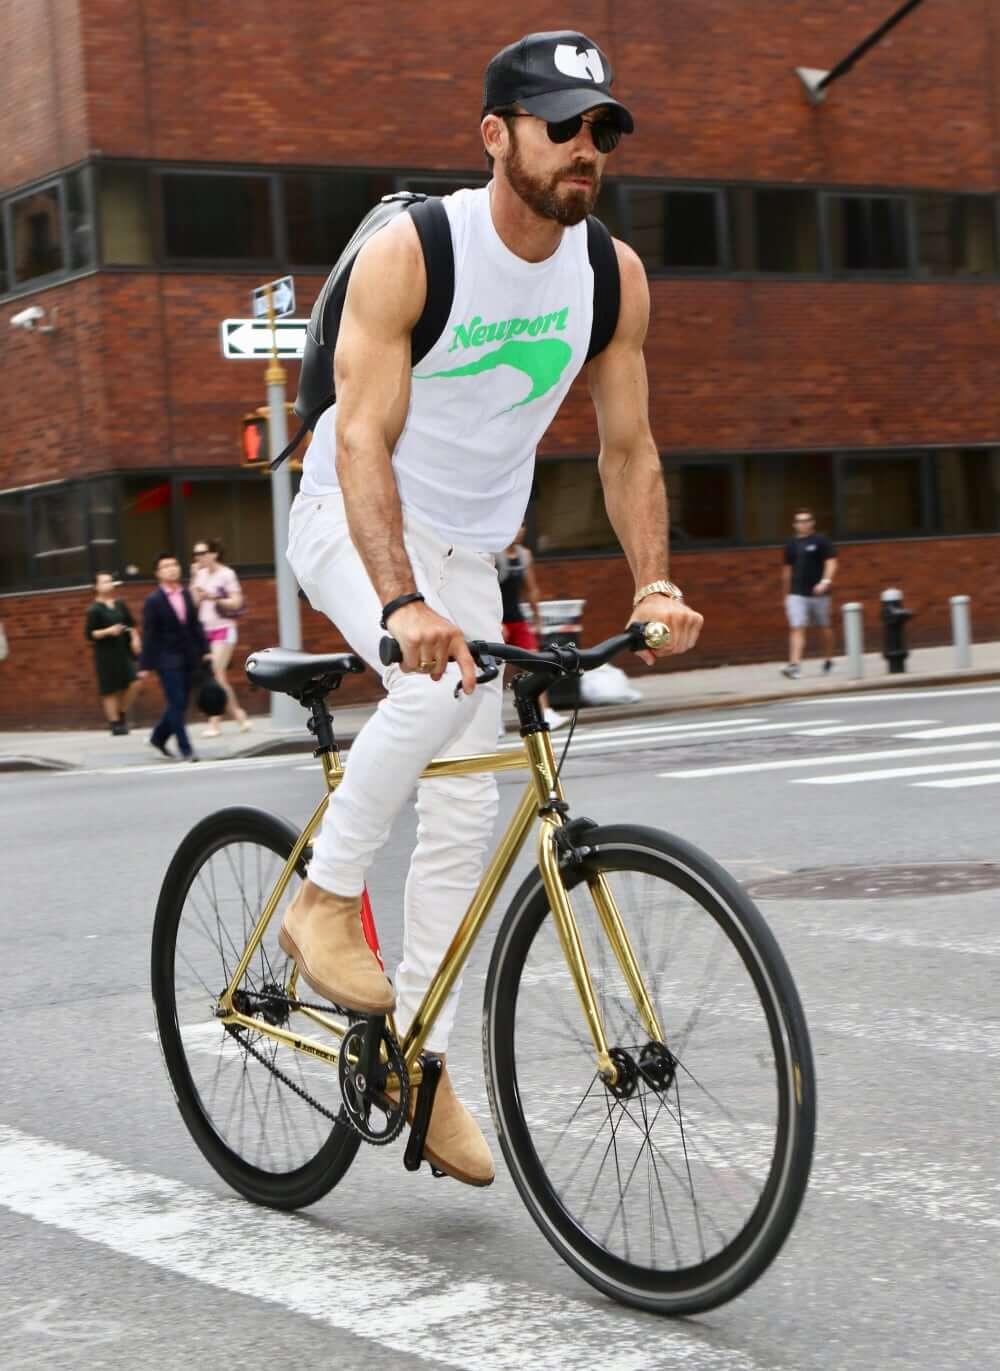 Justin Theroux biking in New York City